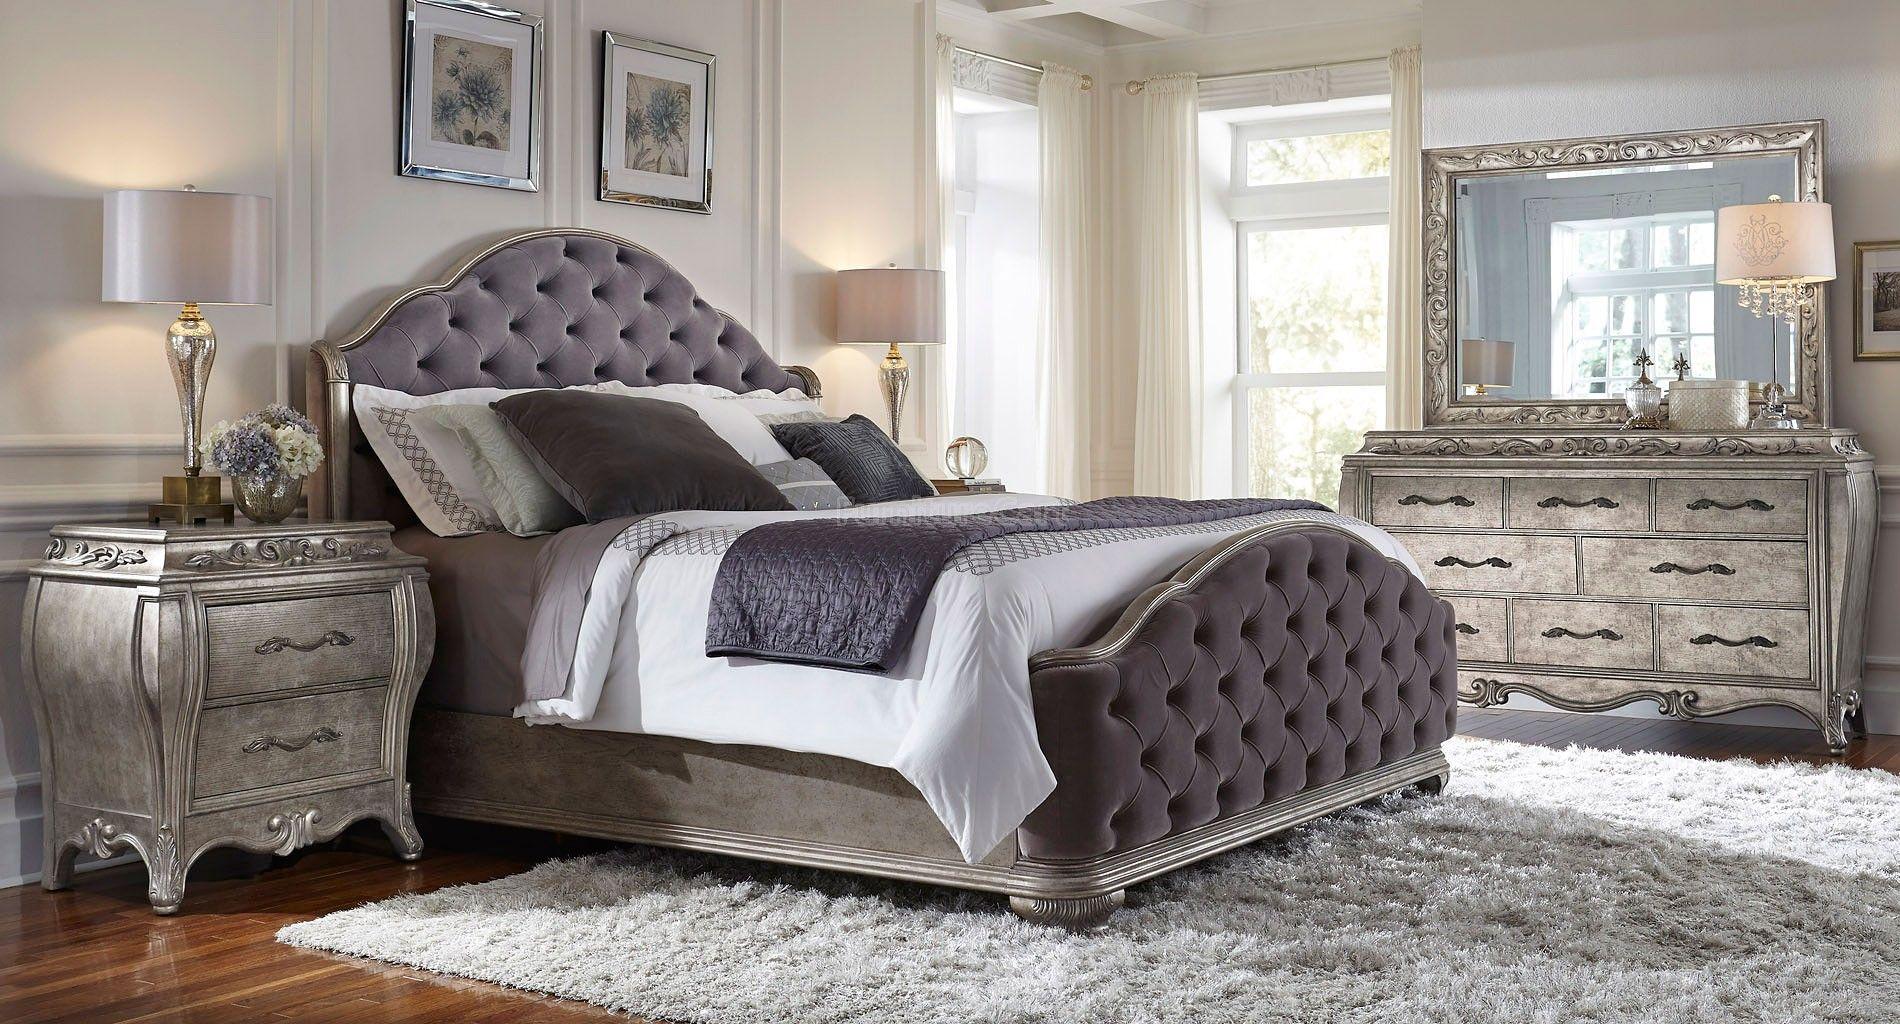 Rhianna Upholstered Bedroom Set Pulaski Furniture